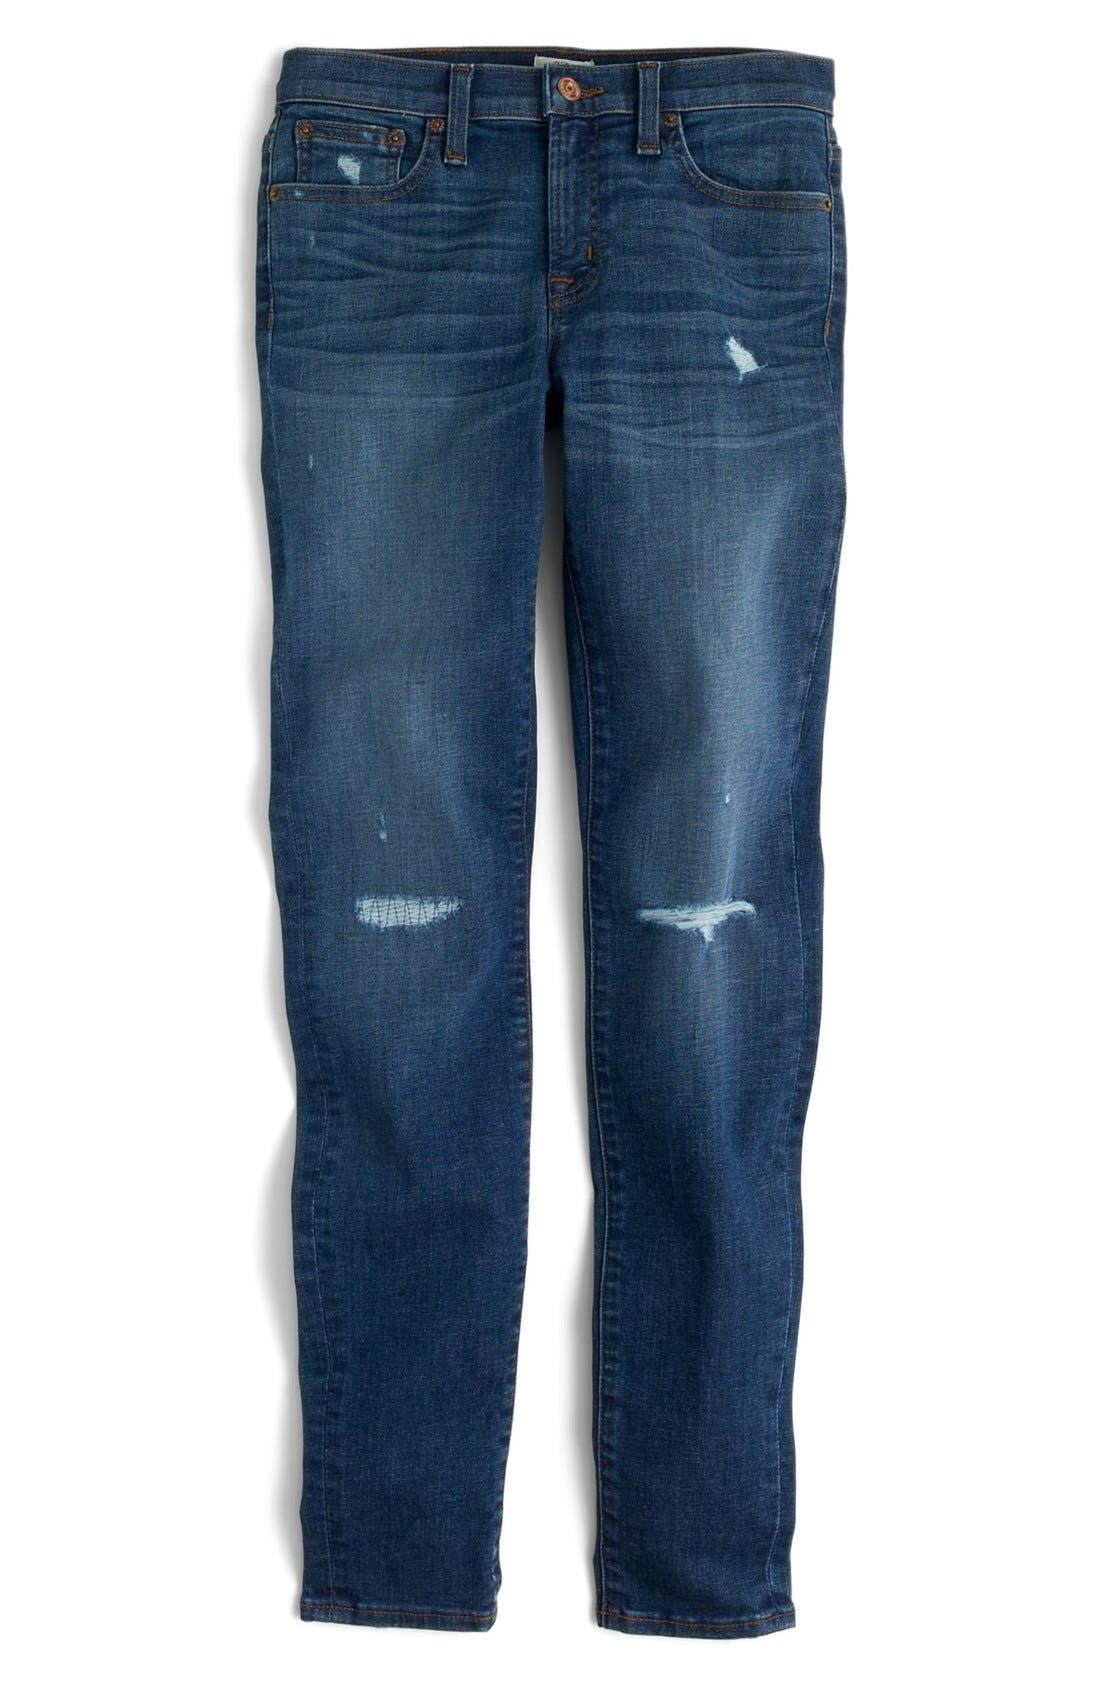 Alternate Image 4  - J.Crew Toothpick Jeans (Pamona) (Regular & Petite)